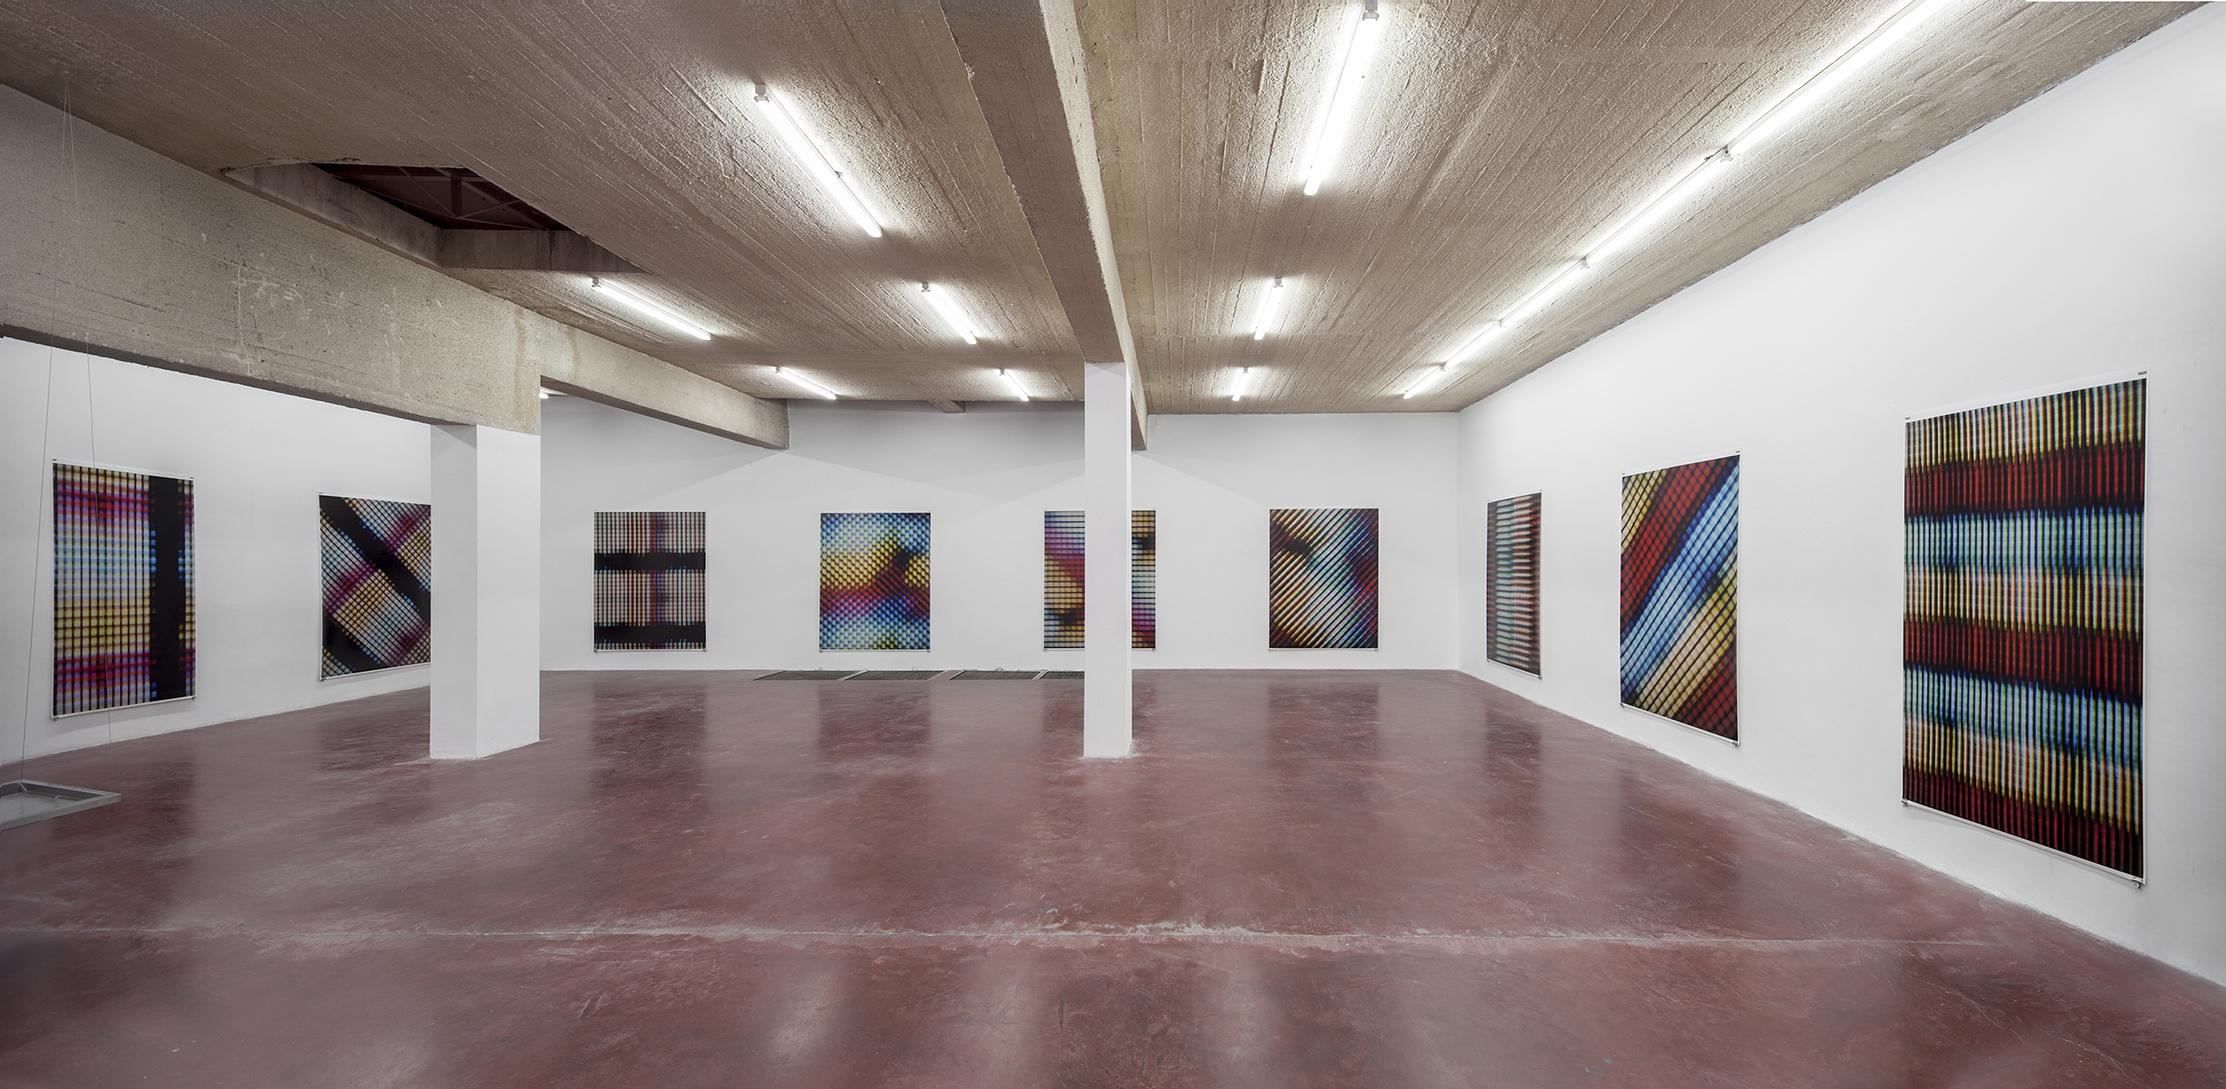 Art exhibit critique essay